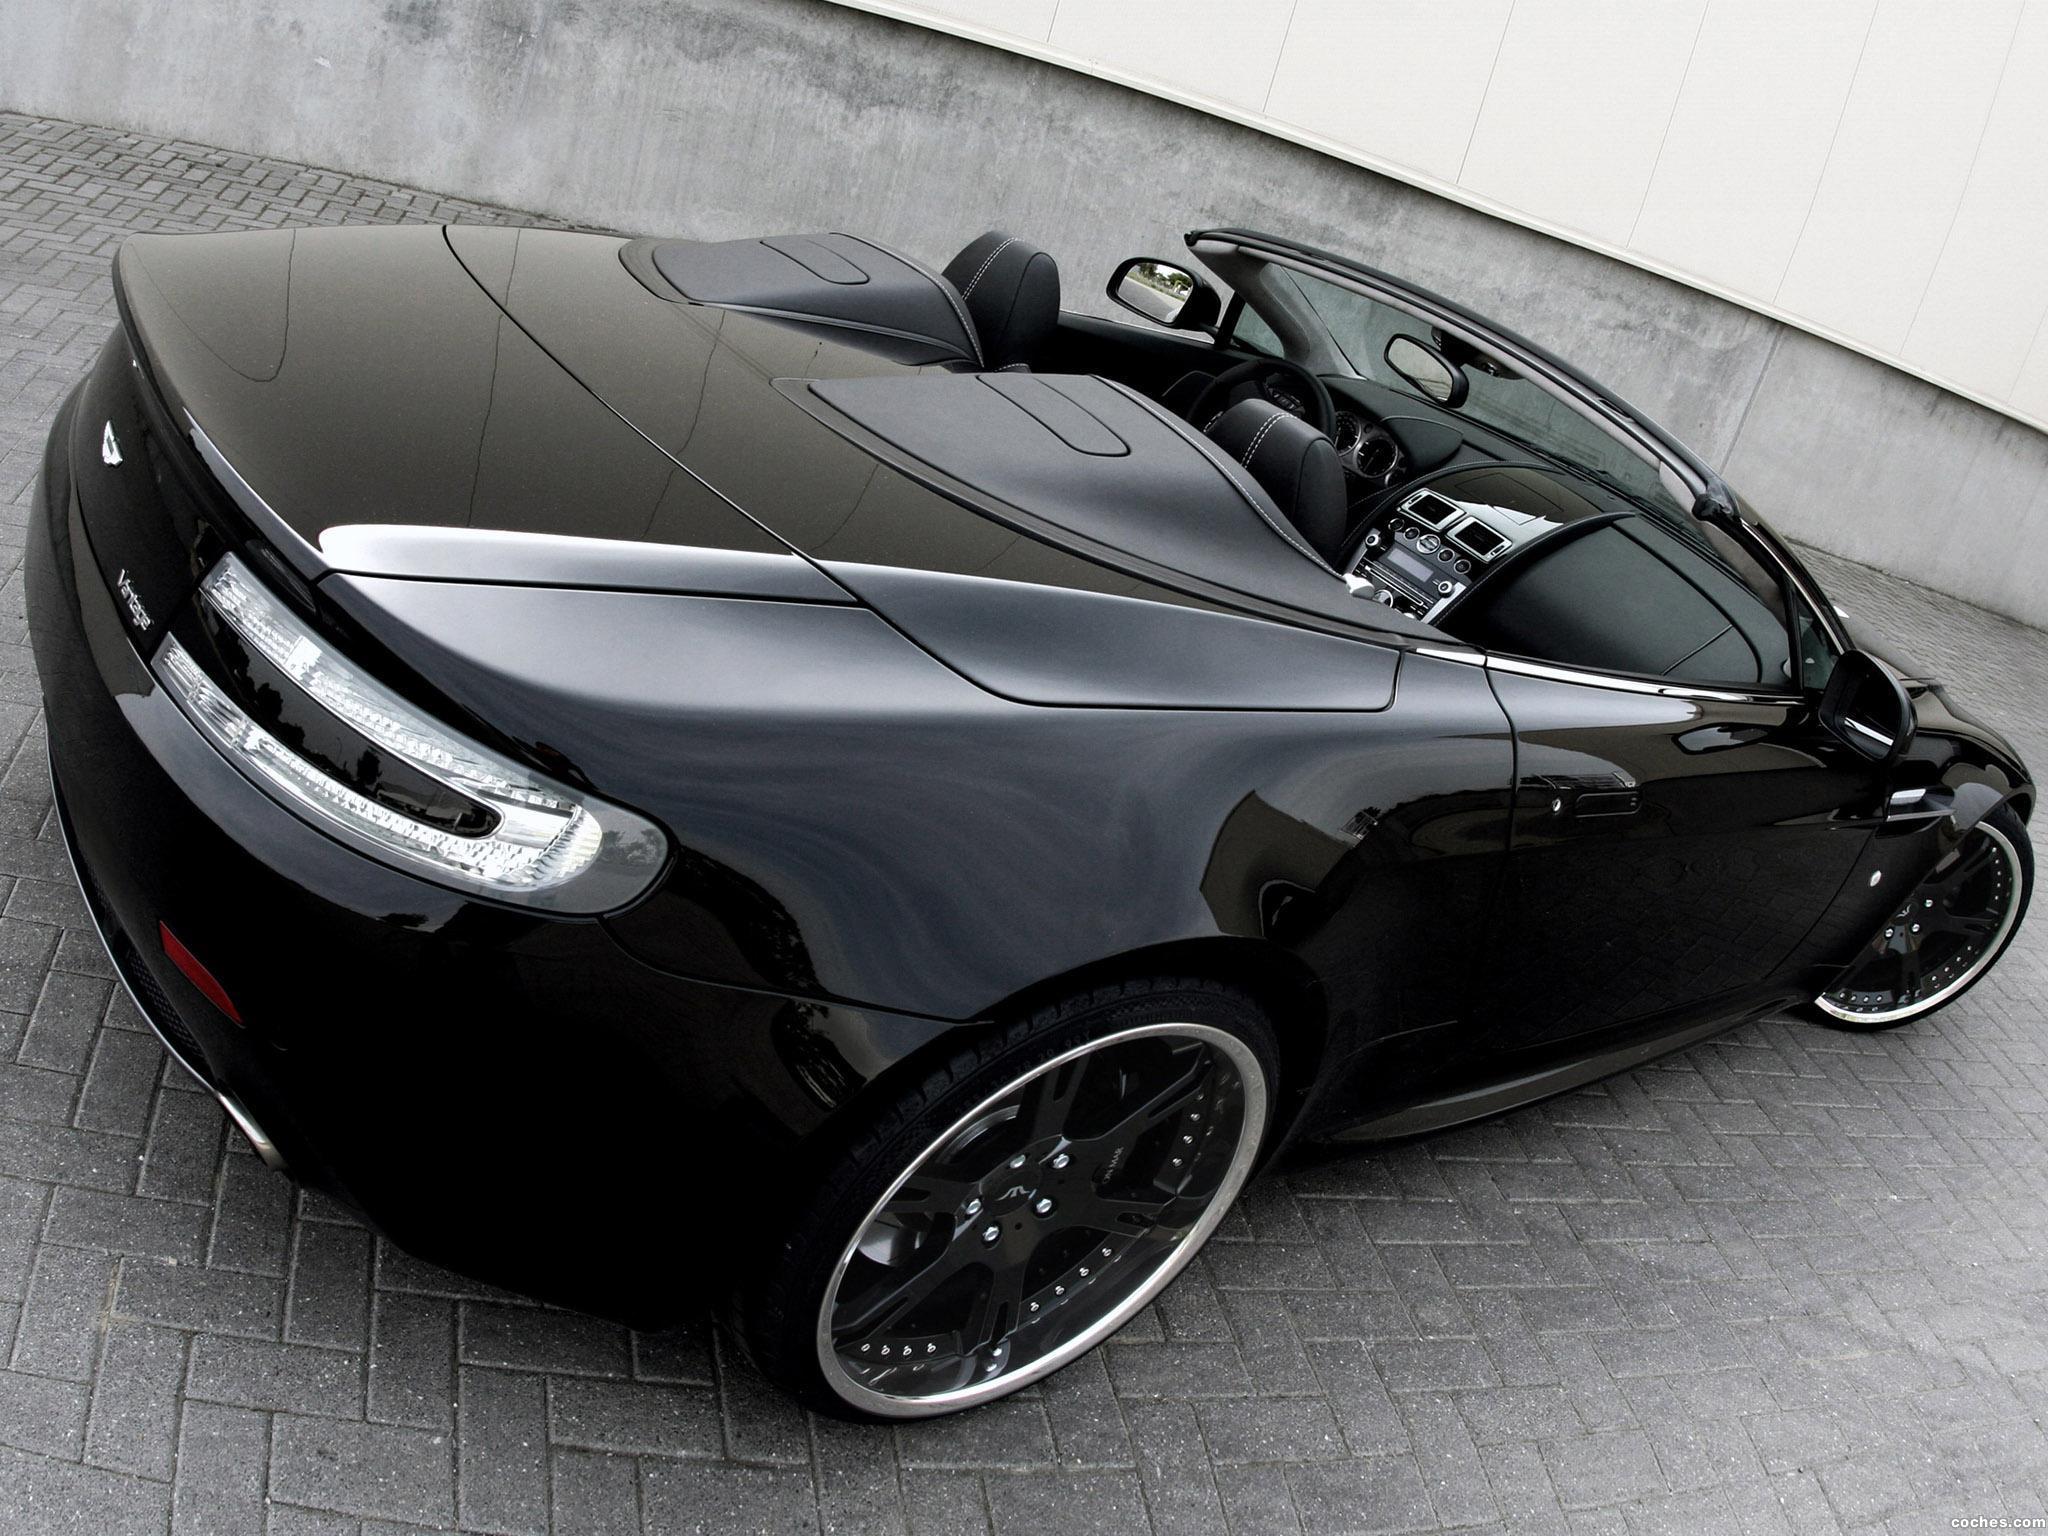 Foto 1 de Wheelsandmore Aston Martin V8 Vantage Roadster 2011